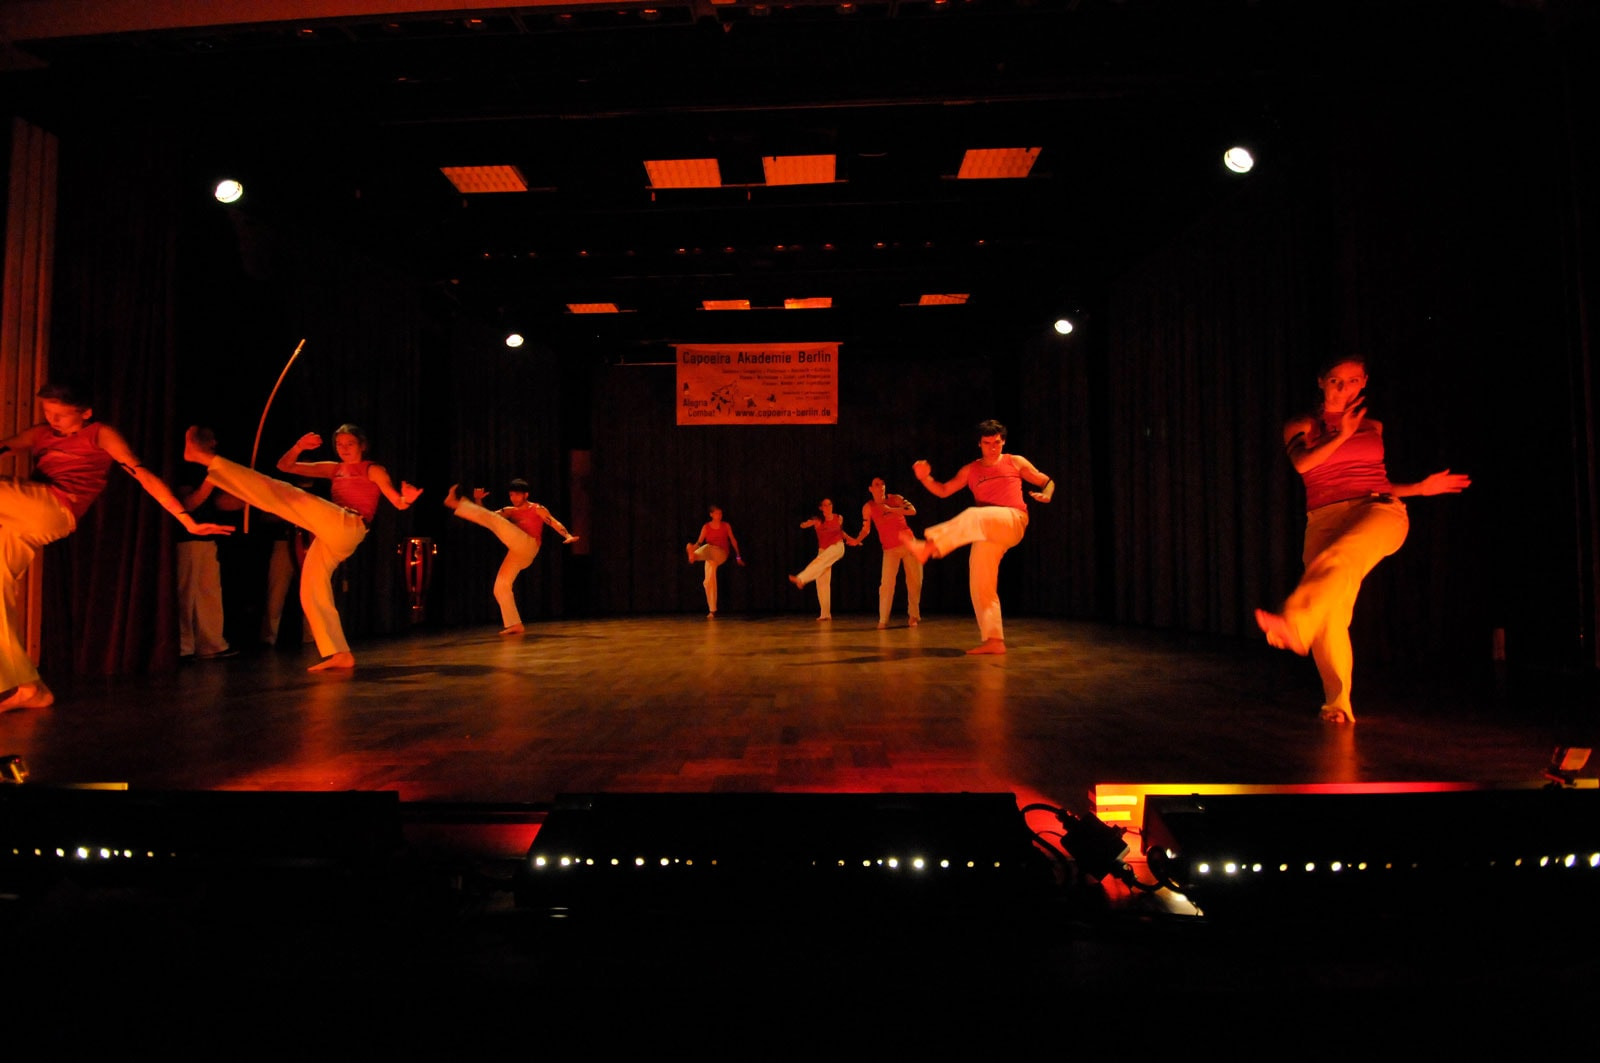 Capoeira Akademie Berlin: Auftritt rot beleuchtet